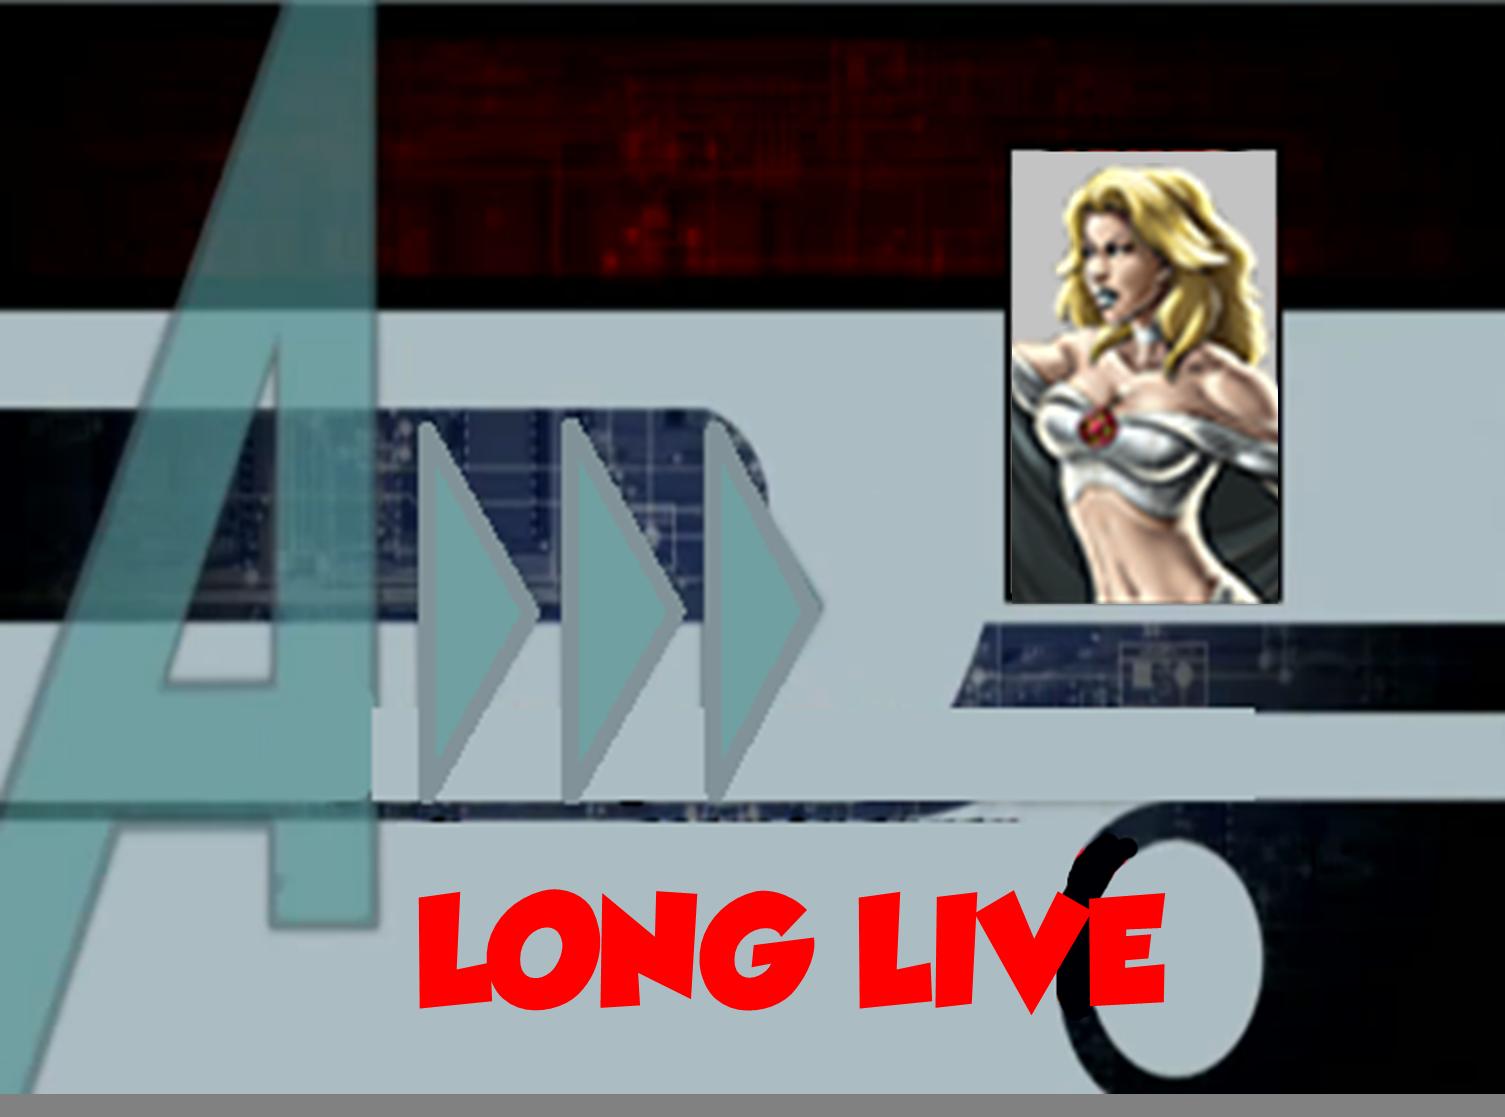 Long Live (A!)